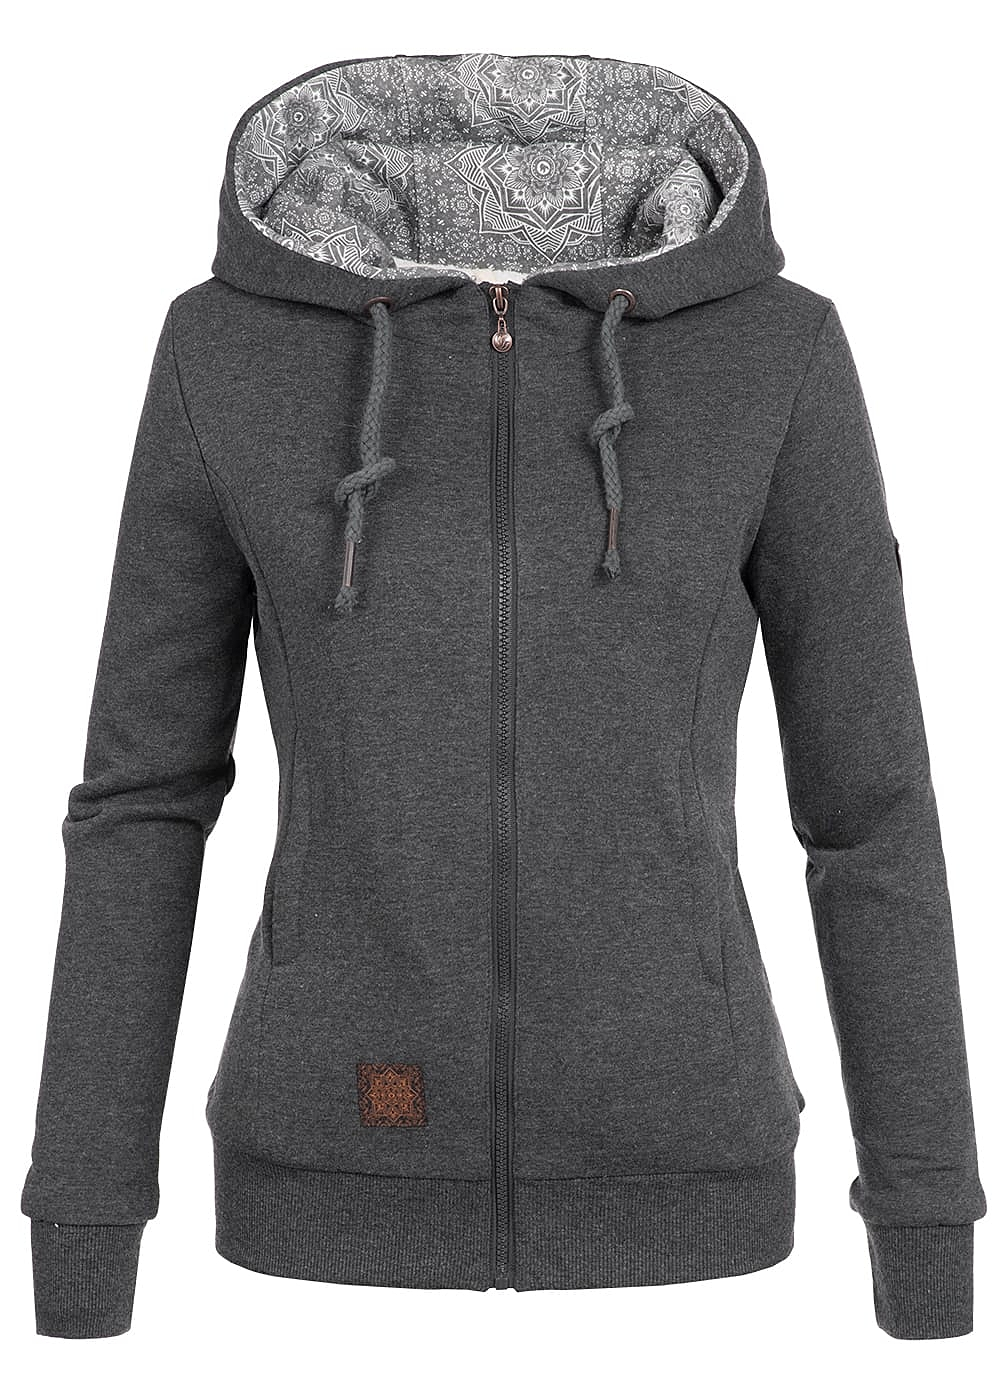 aiki damen sweat jacke zip hoodie kunstfellfutter kapuze 2. Black Bedroom Furniture Sets. Home Design Ideas